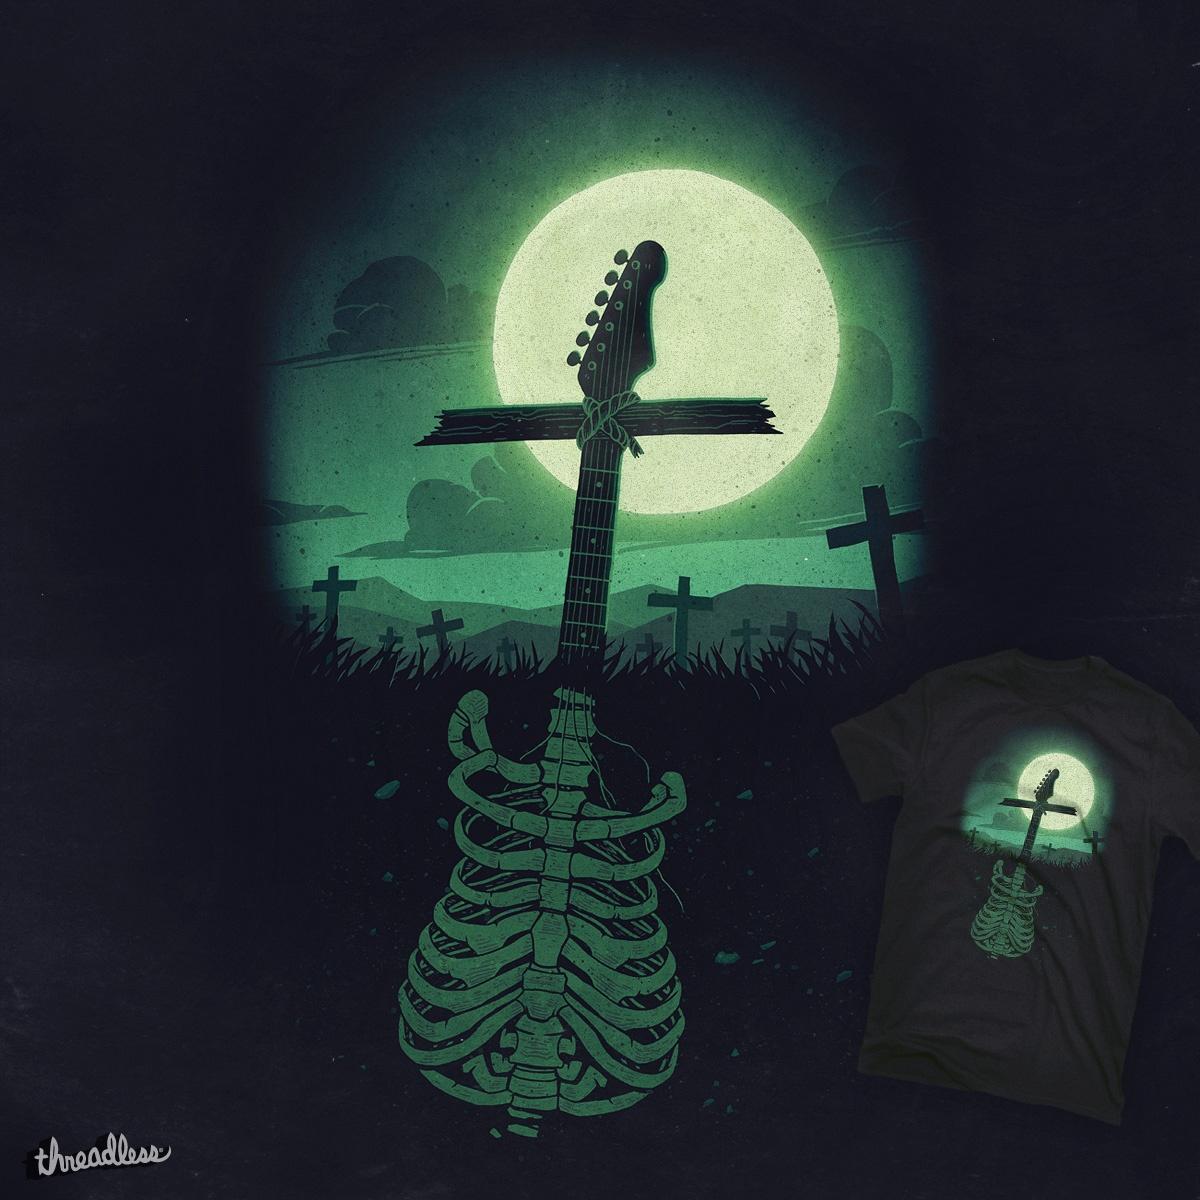 Rock Till Death! by tetsoo on Threadless